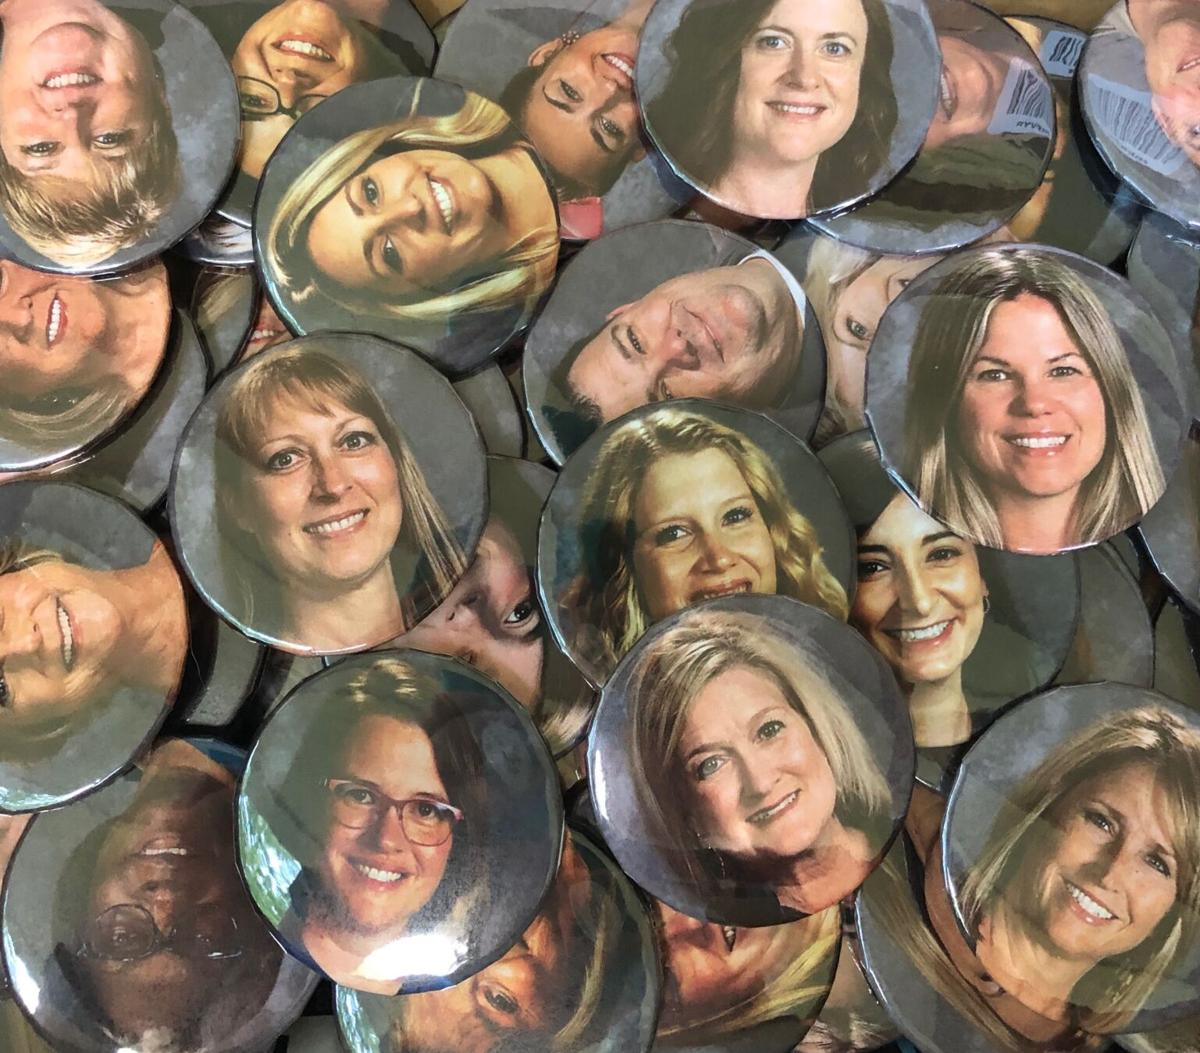 Williamson County Schools teacher buttons COVID-19 face masks